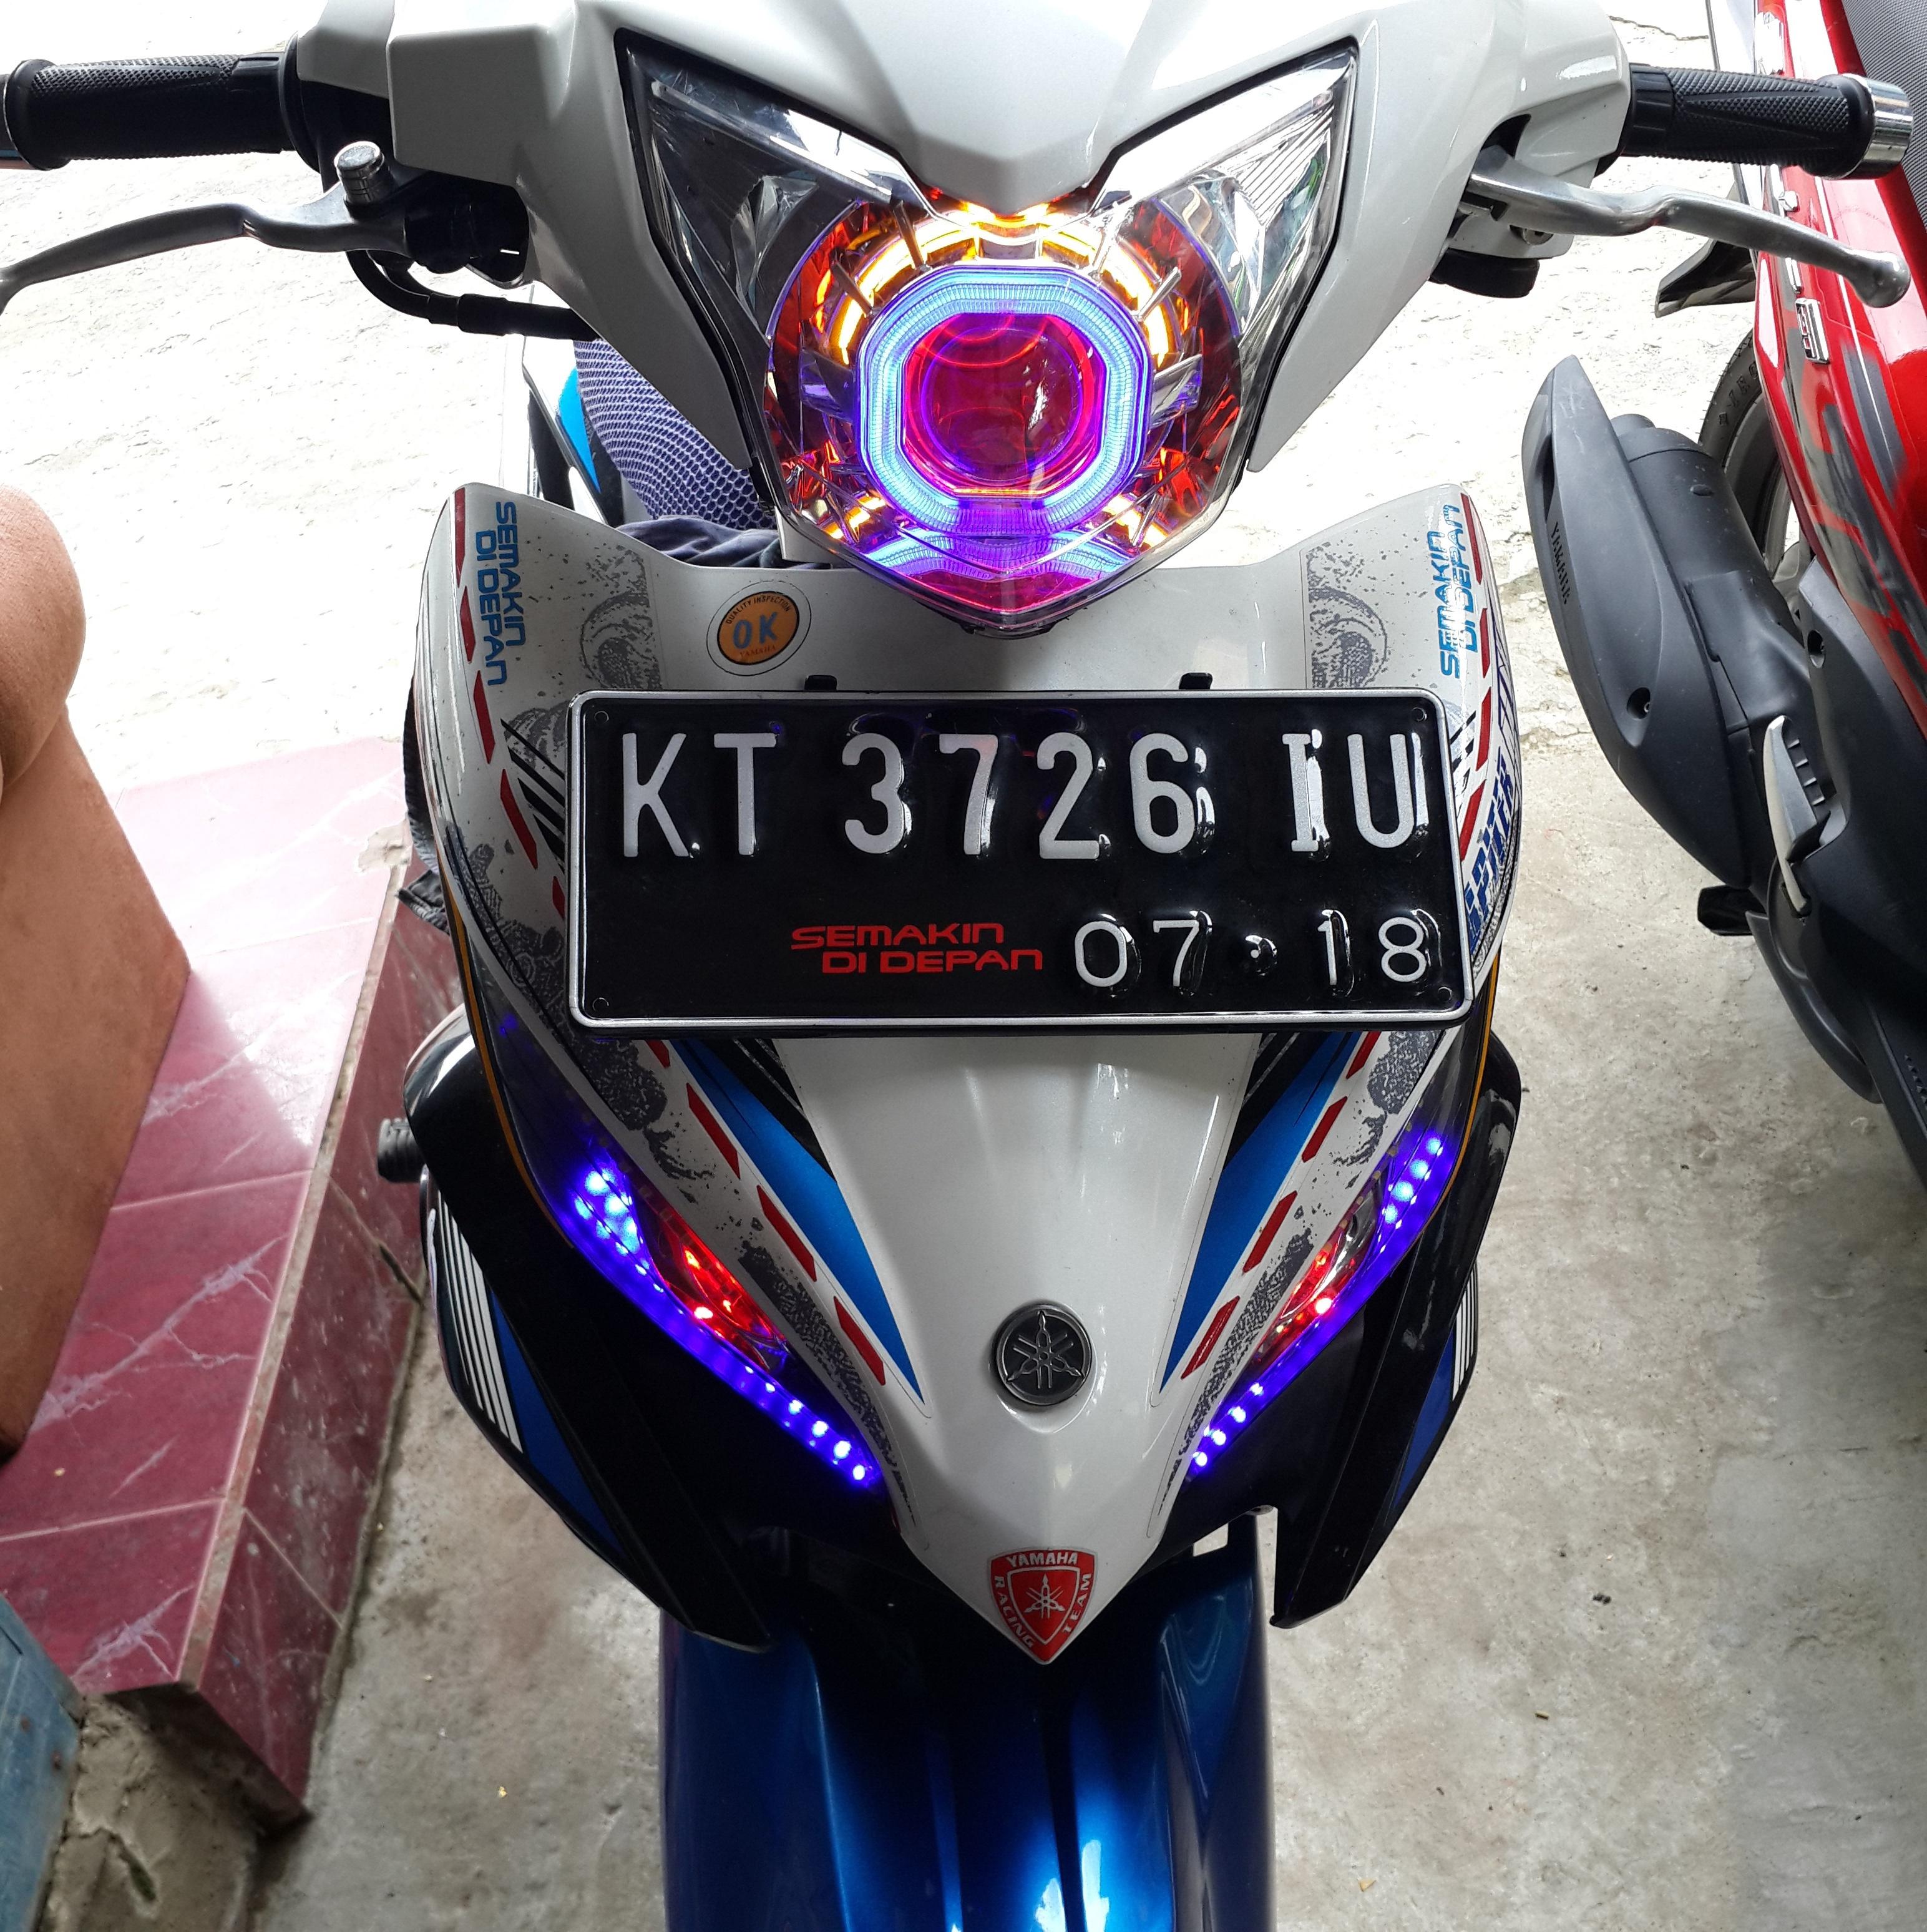 Yamaha Jupiter MX 135 Pakai HID Projector MH1AES G1S Yamaha